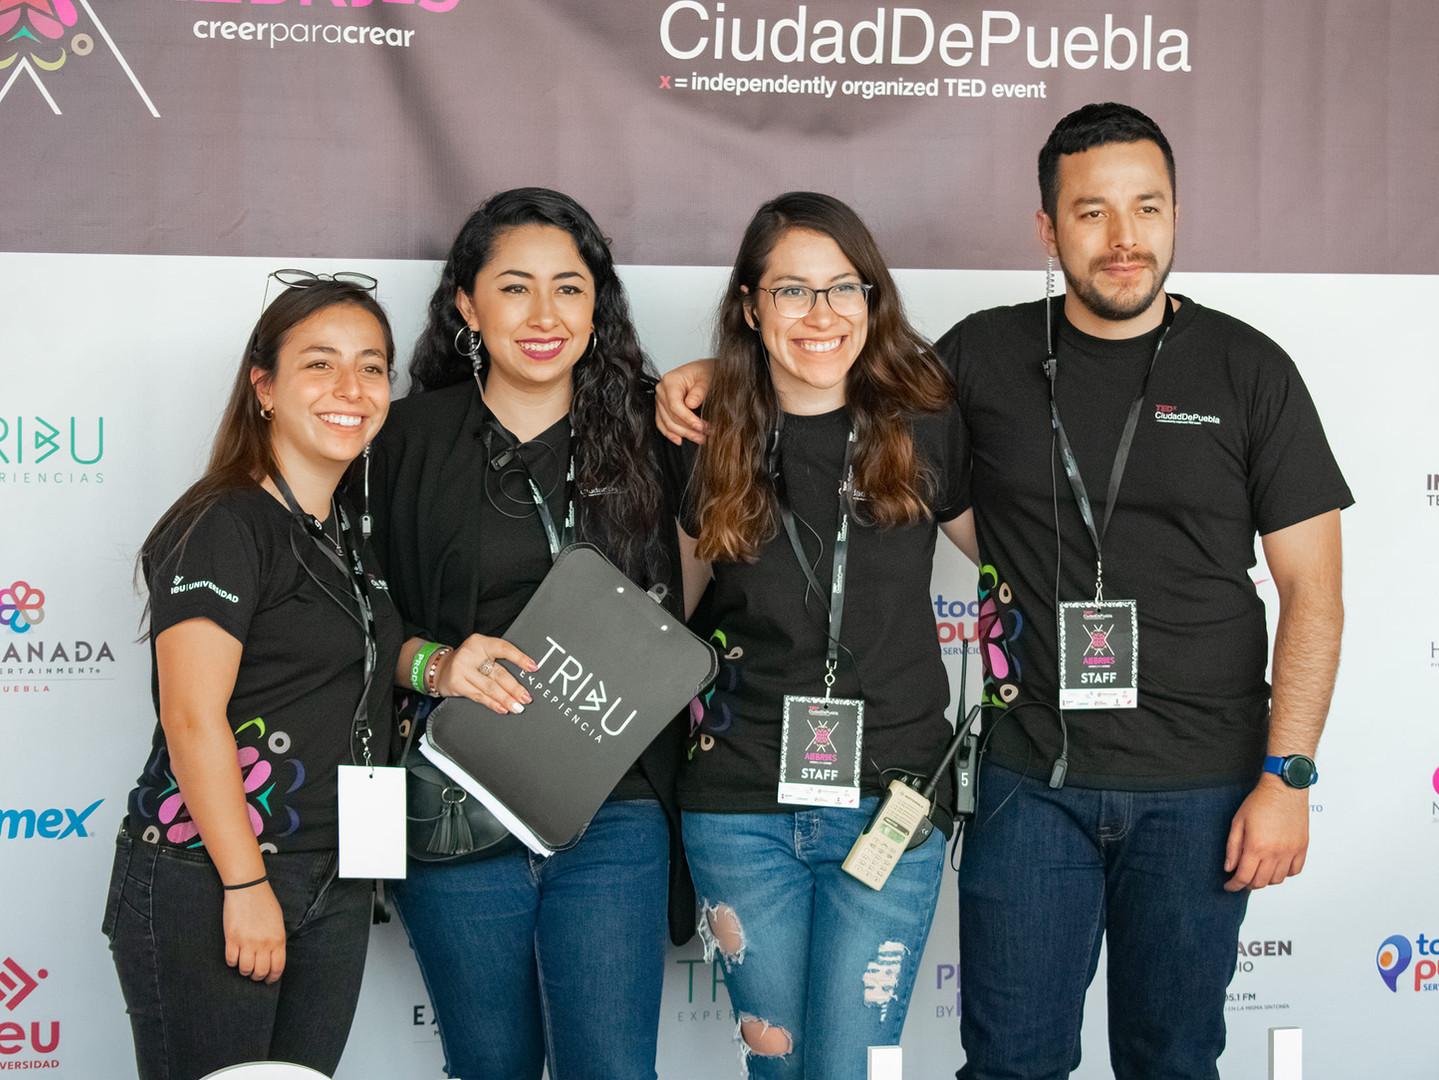 TRIBU Experiencias-TEDx-TED Talks-Puebla